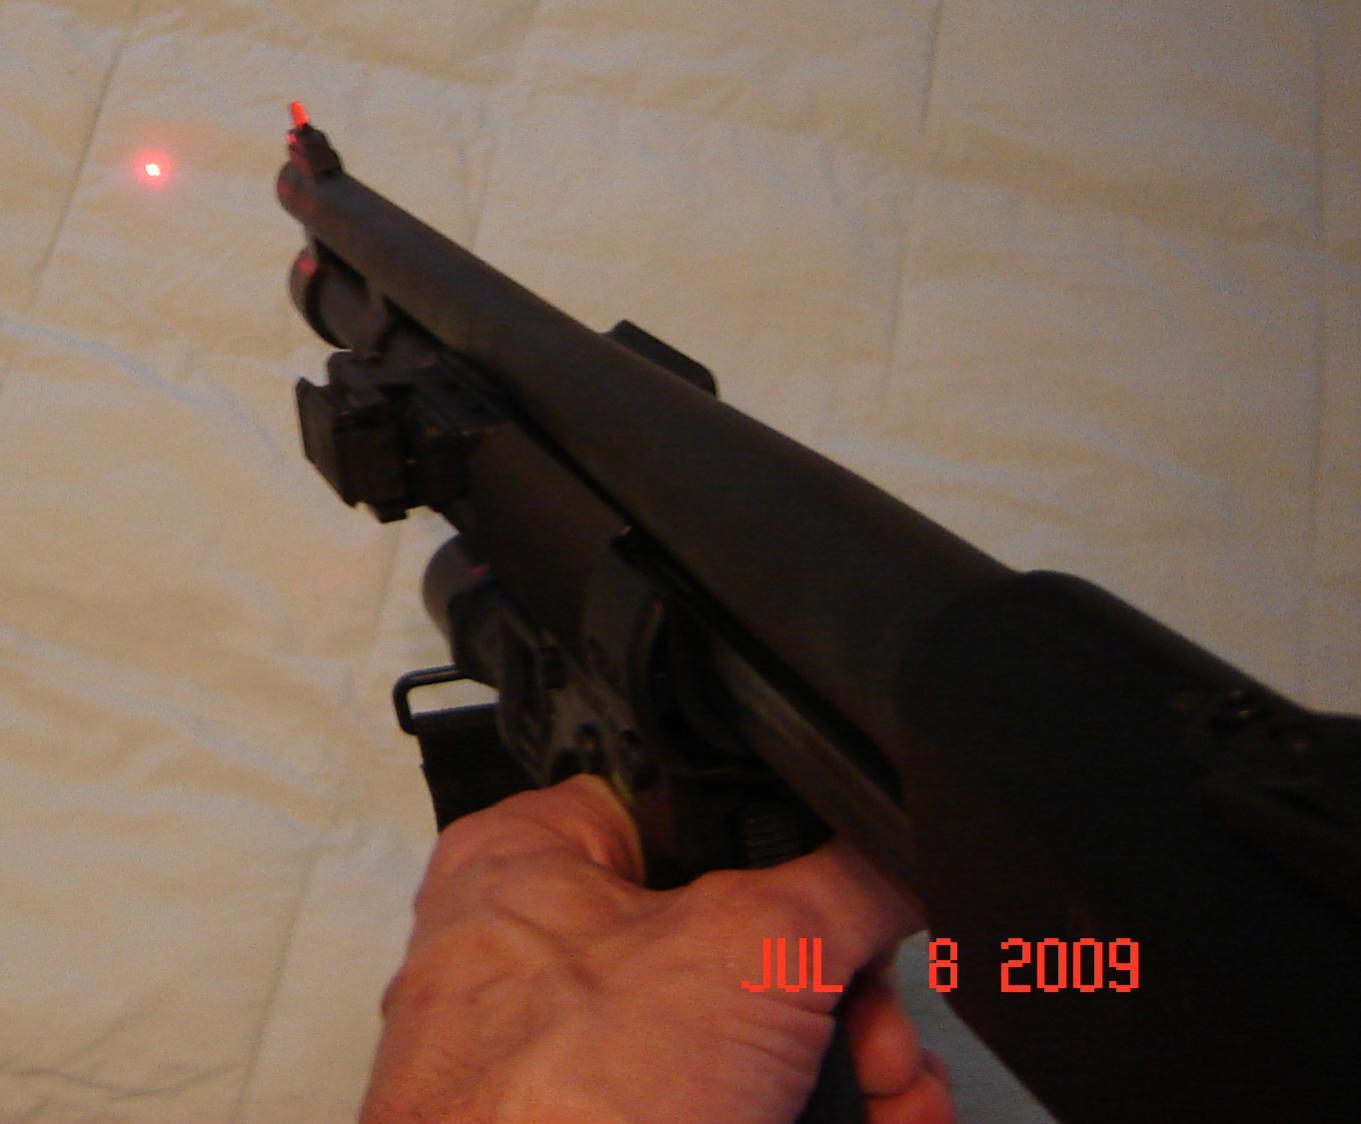 Recommendations for BRIGHT light for Mossberg 500-pistol-grip-pump-007.jpg